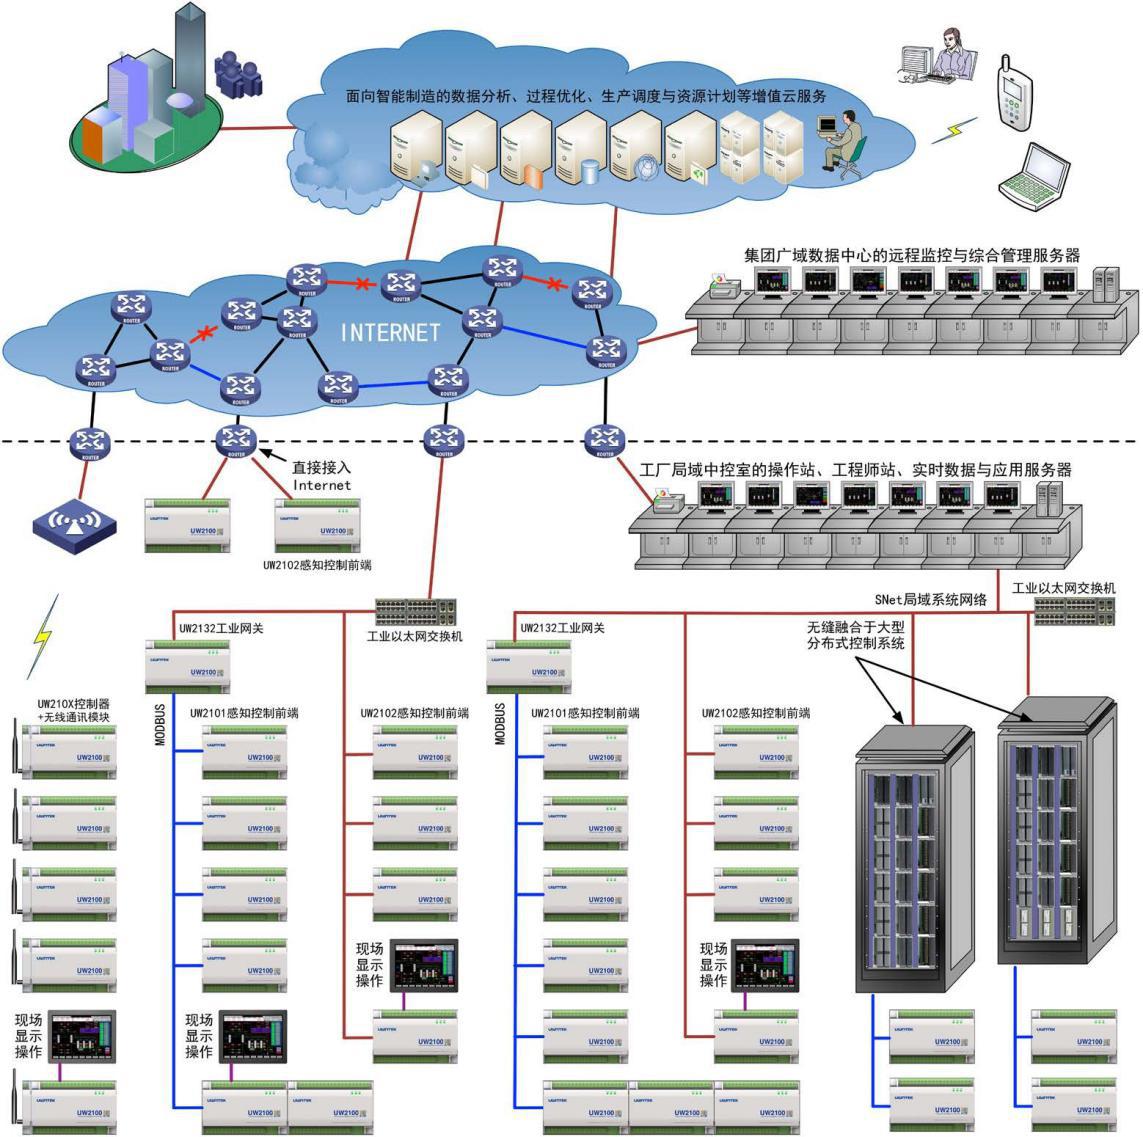 UW2100 工业物联网控制系统及智慧云平台